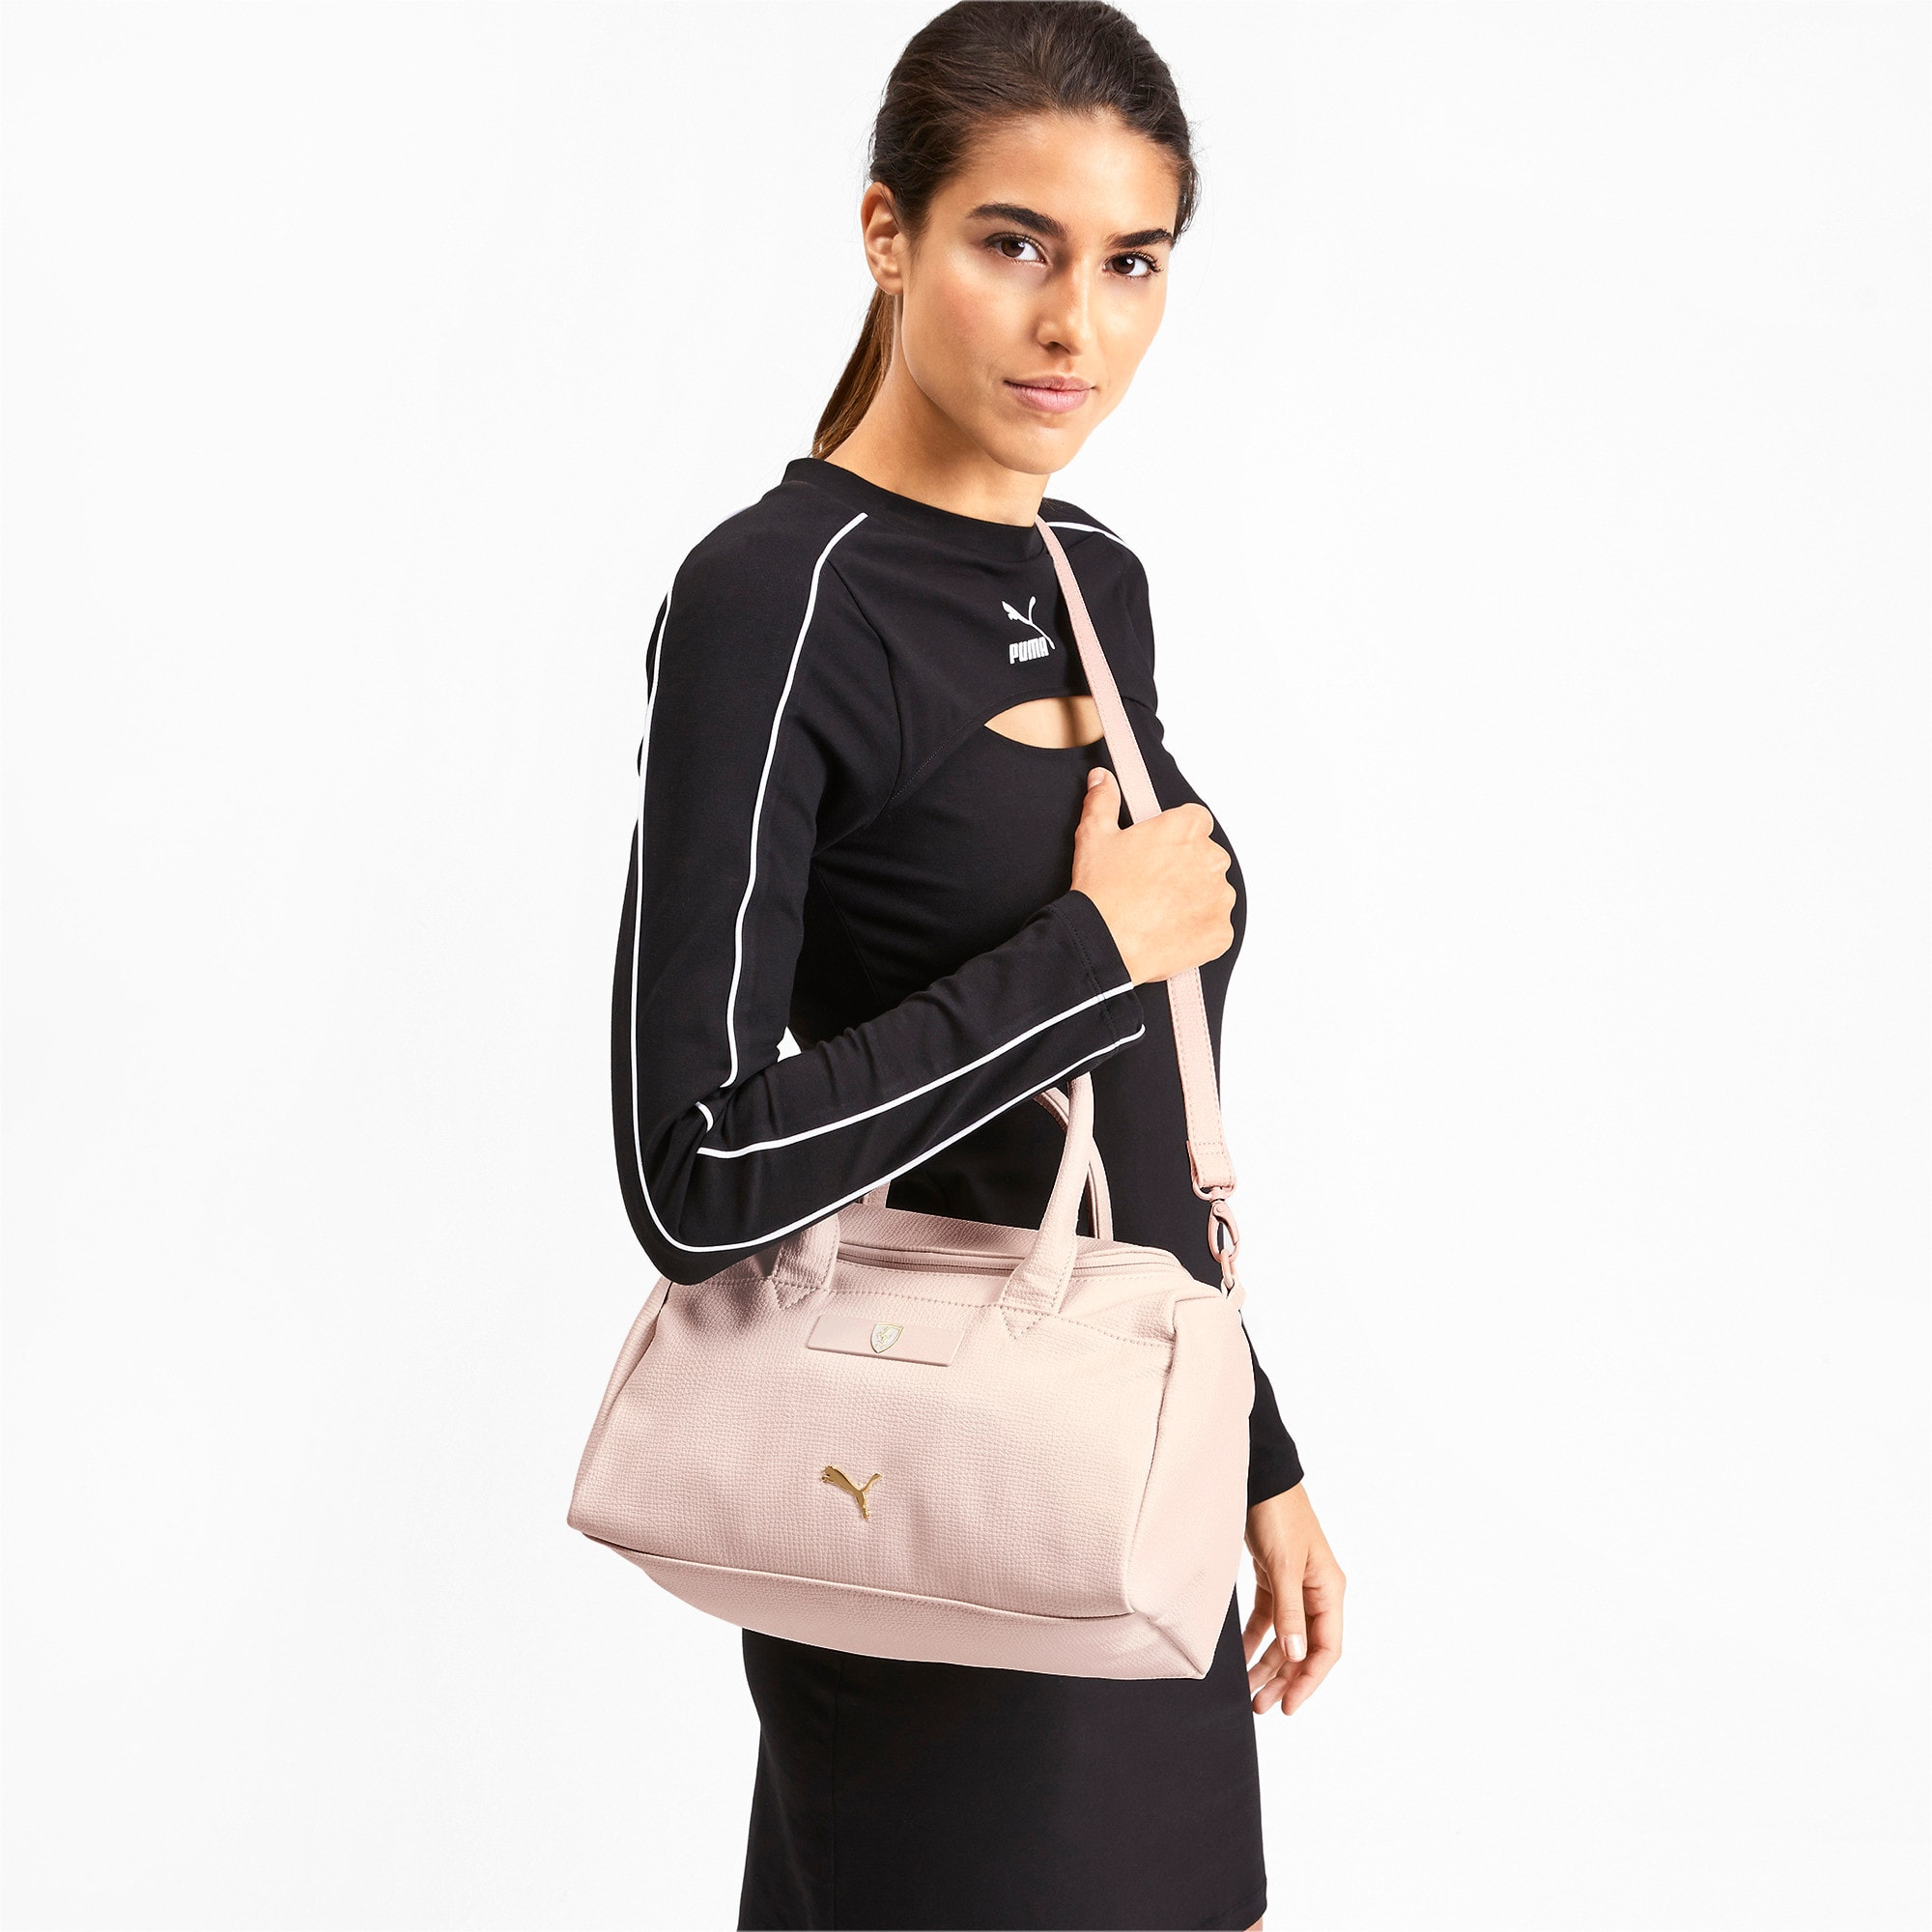 Thumbnail 2 of Ferrari Lifestyle Women's Handbag, Pastel Parchment, medium-IND